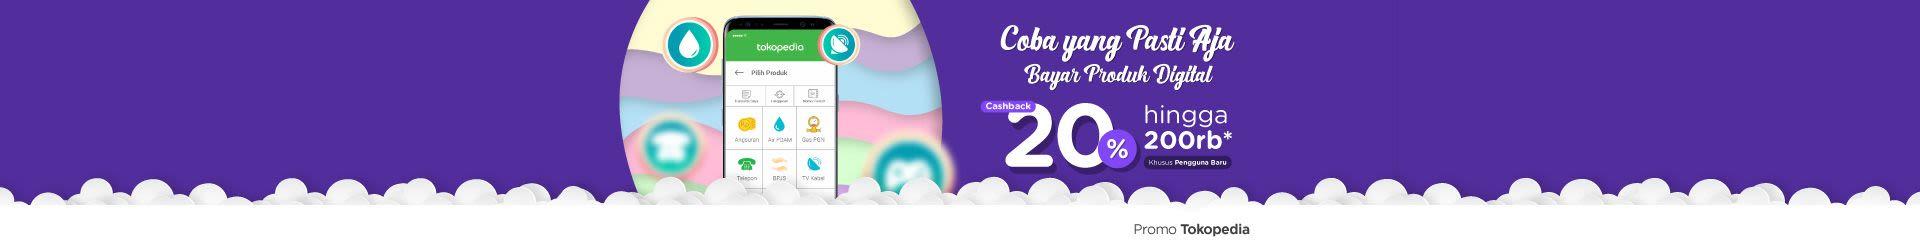 Bayar Produk Digitalmu Pertama Kali, Cashback hingga 200rb!